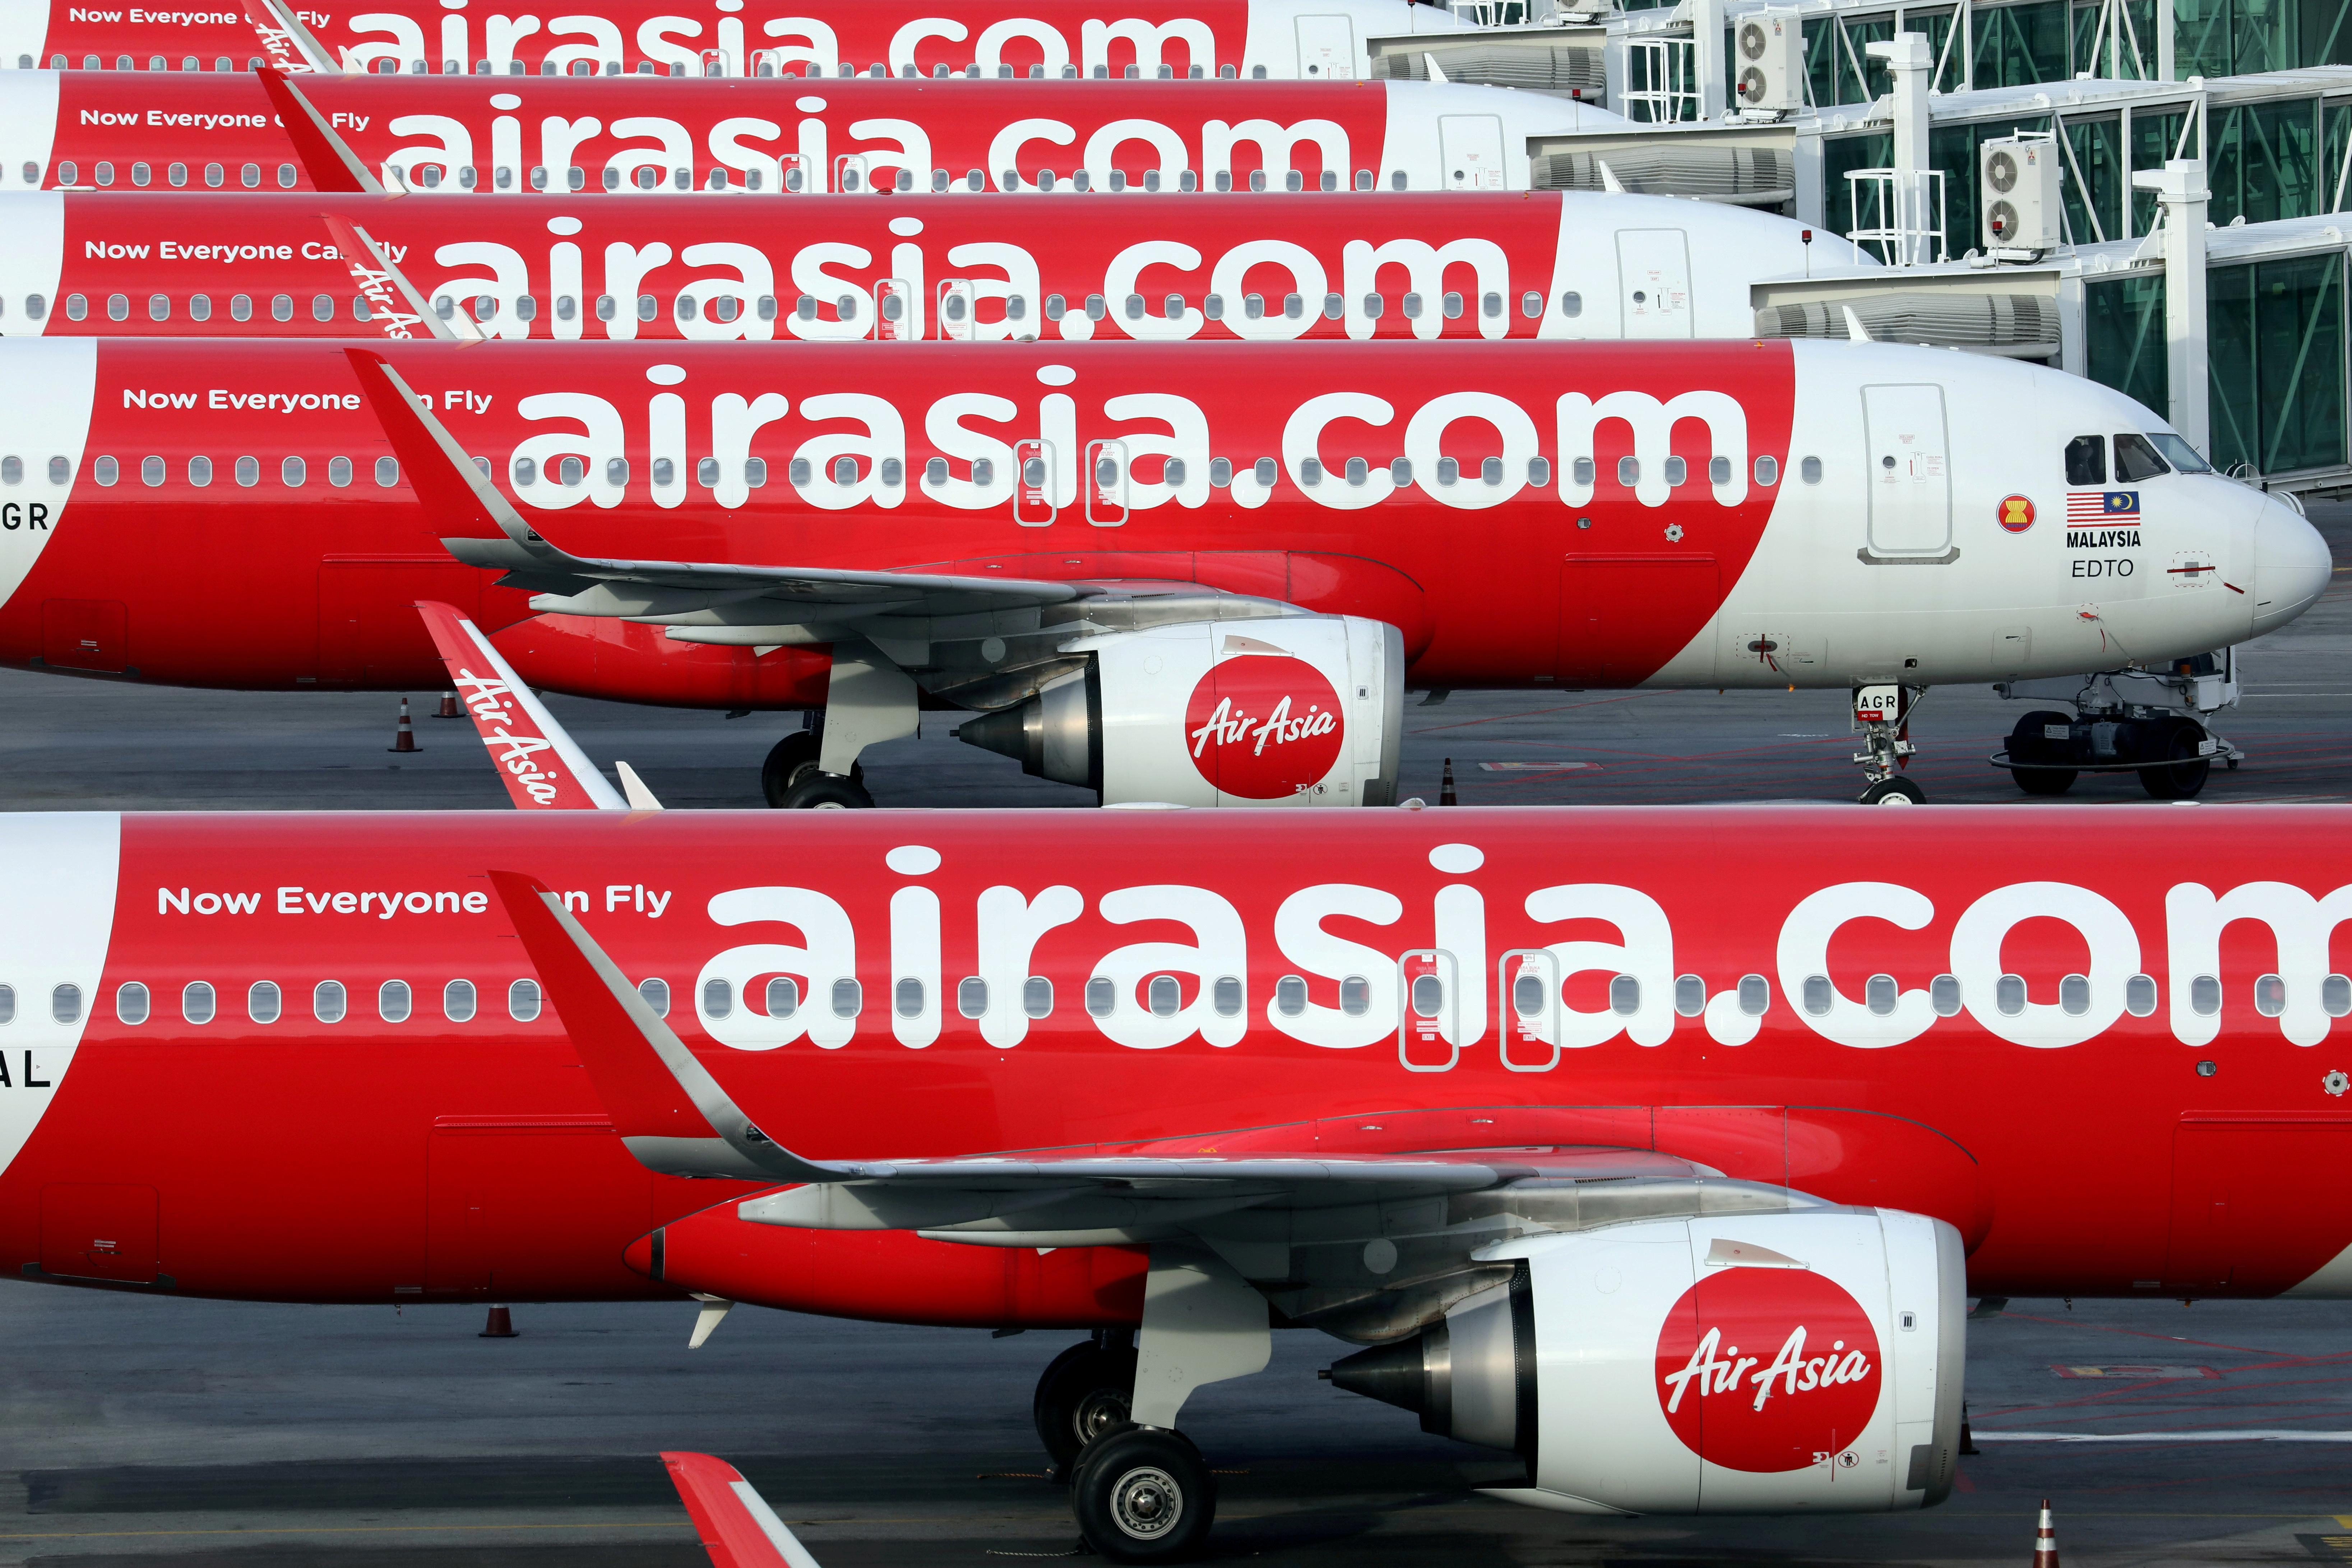 Airasia planes are seen parked at Kuala Lumpur International Airport 2, amid the coronavirus disease (COVID-19) outbreak in Sepang, Malaysia October 6, 2020. REUTERS/Lim Huey Teng/File Photo